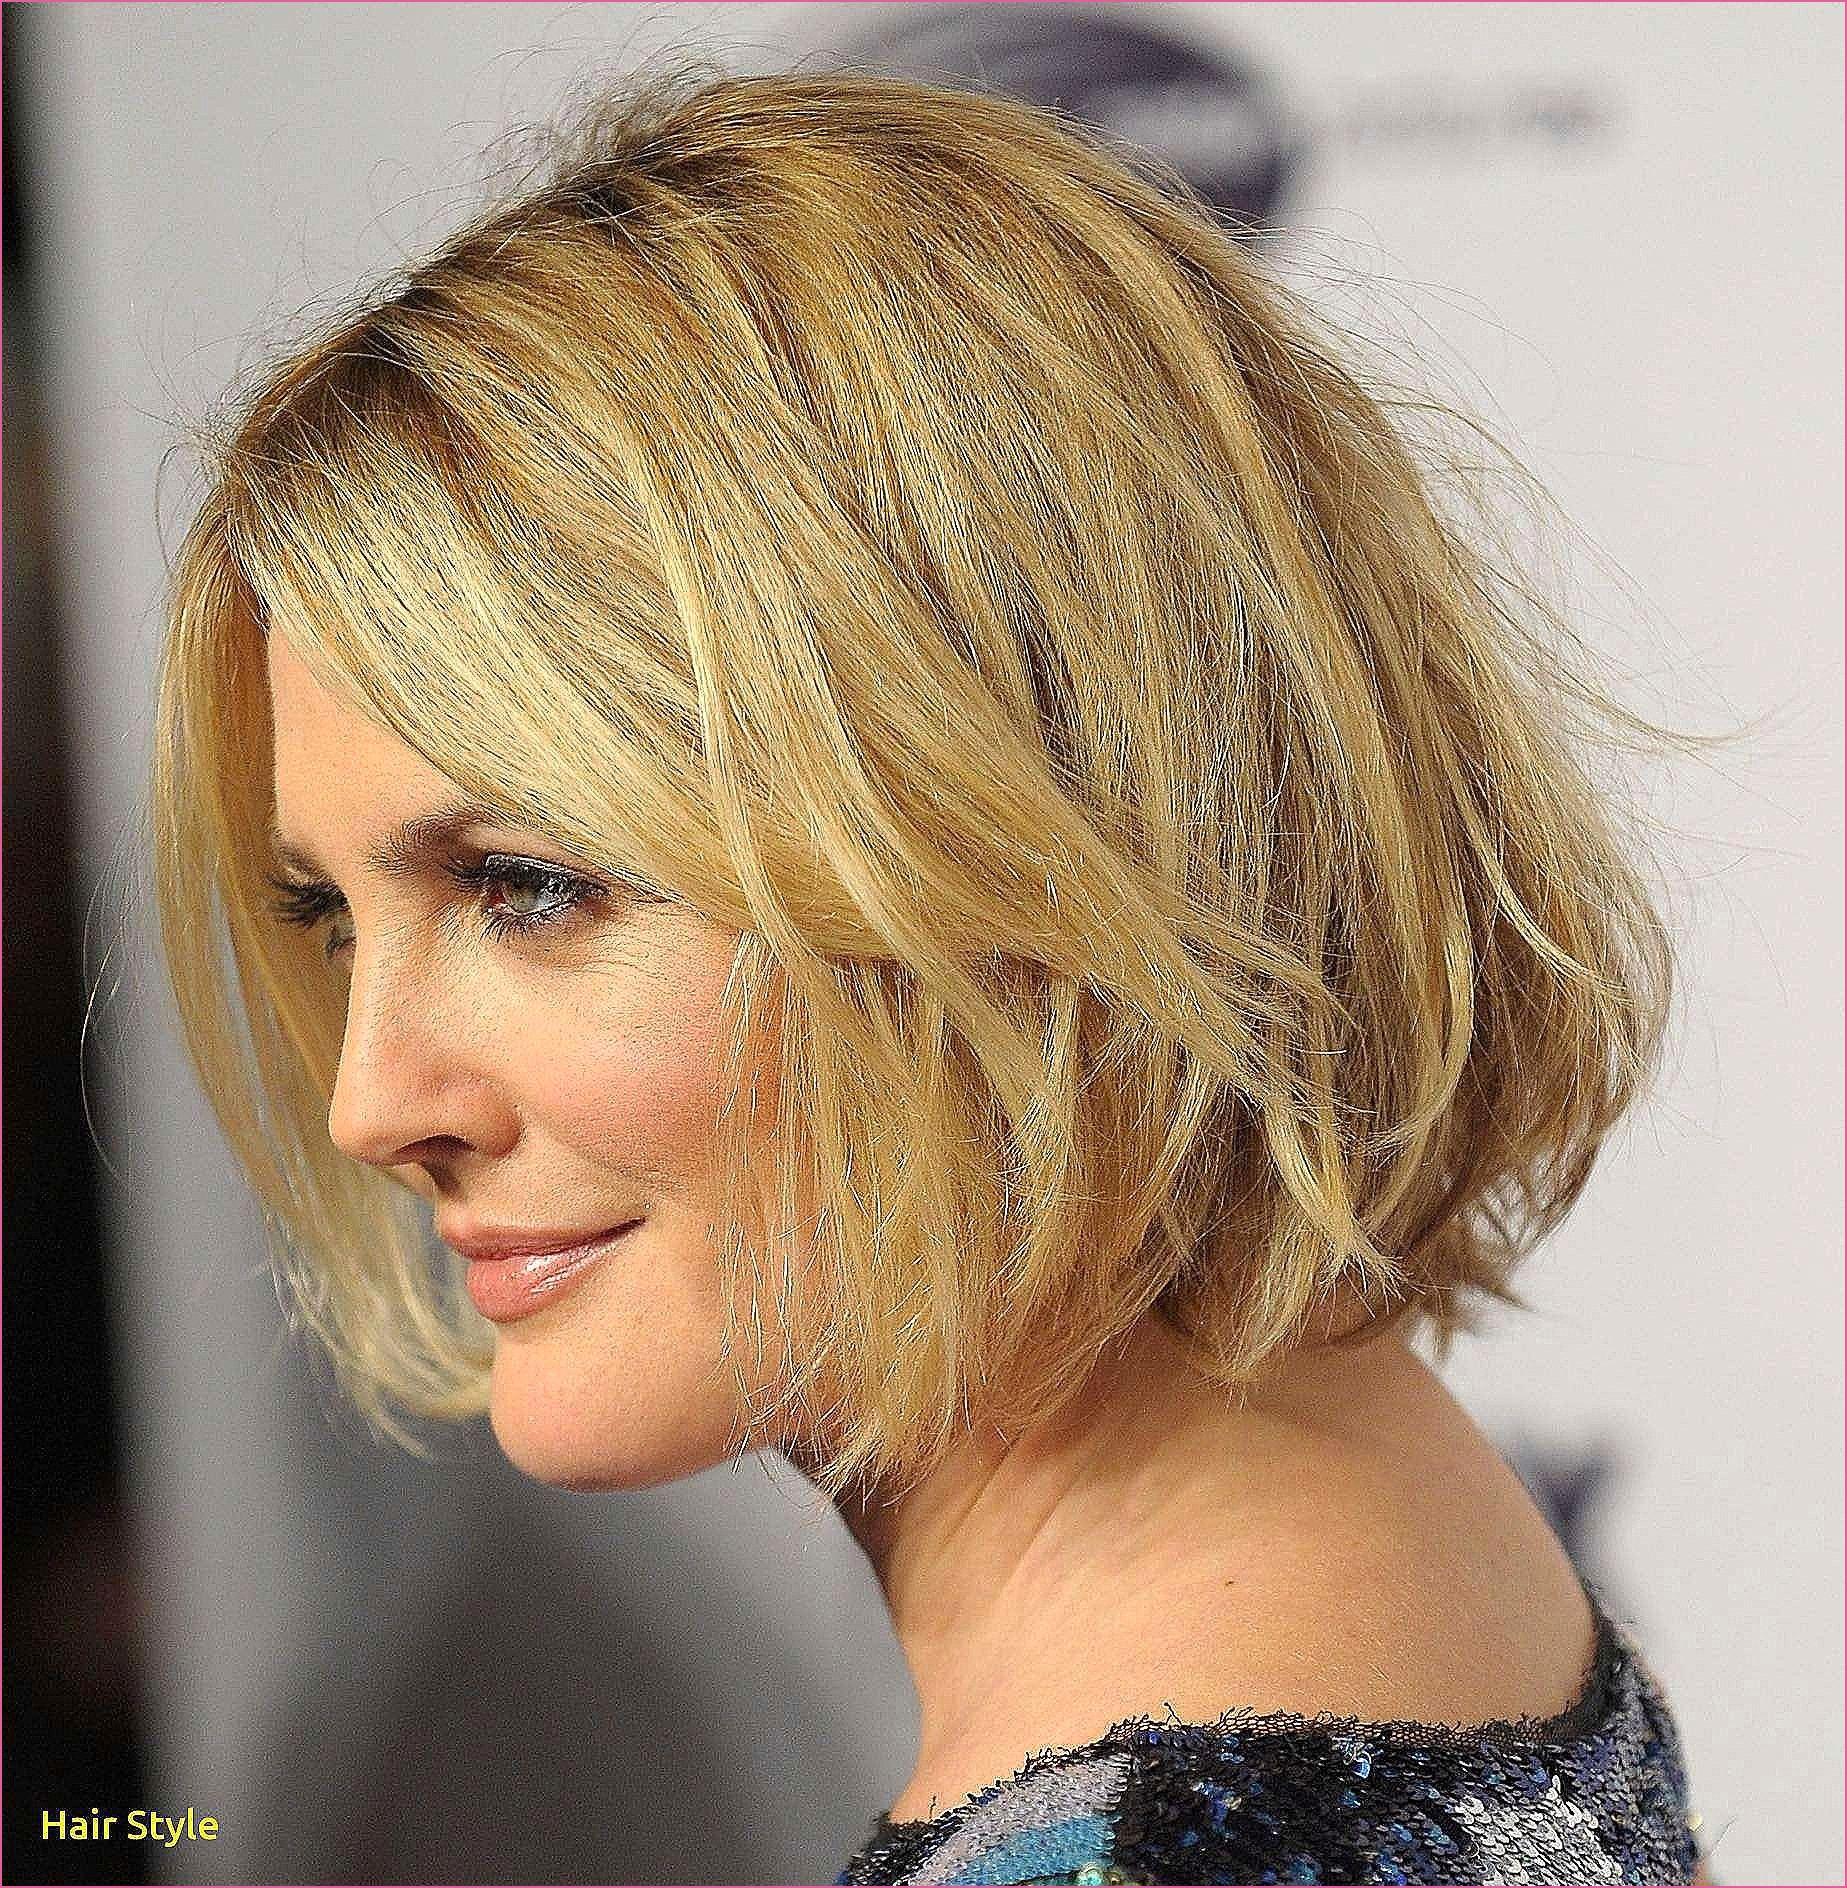 Blonde Haare Manner Trend Teil Frisuren Lange Haare Bob Bob Frisur Kurzhaarfrisuren